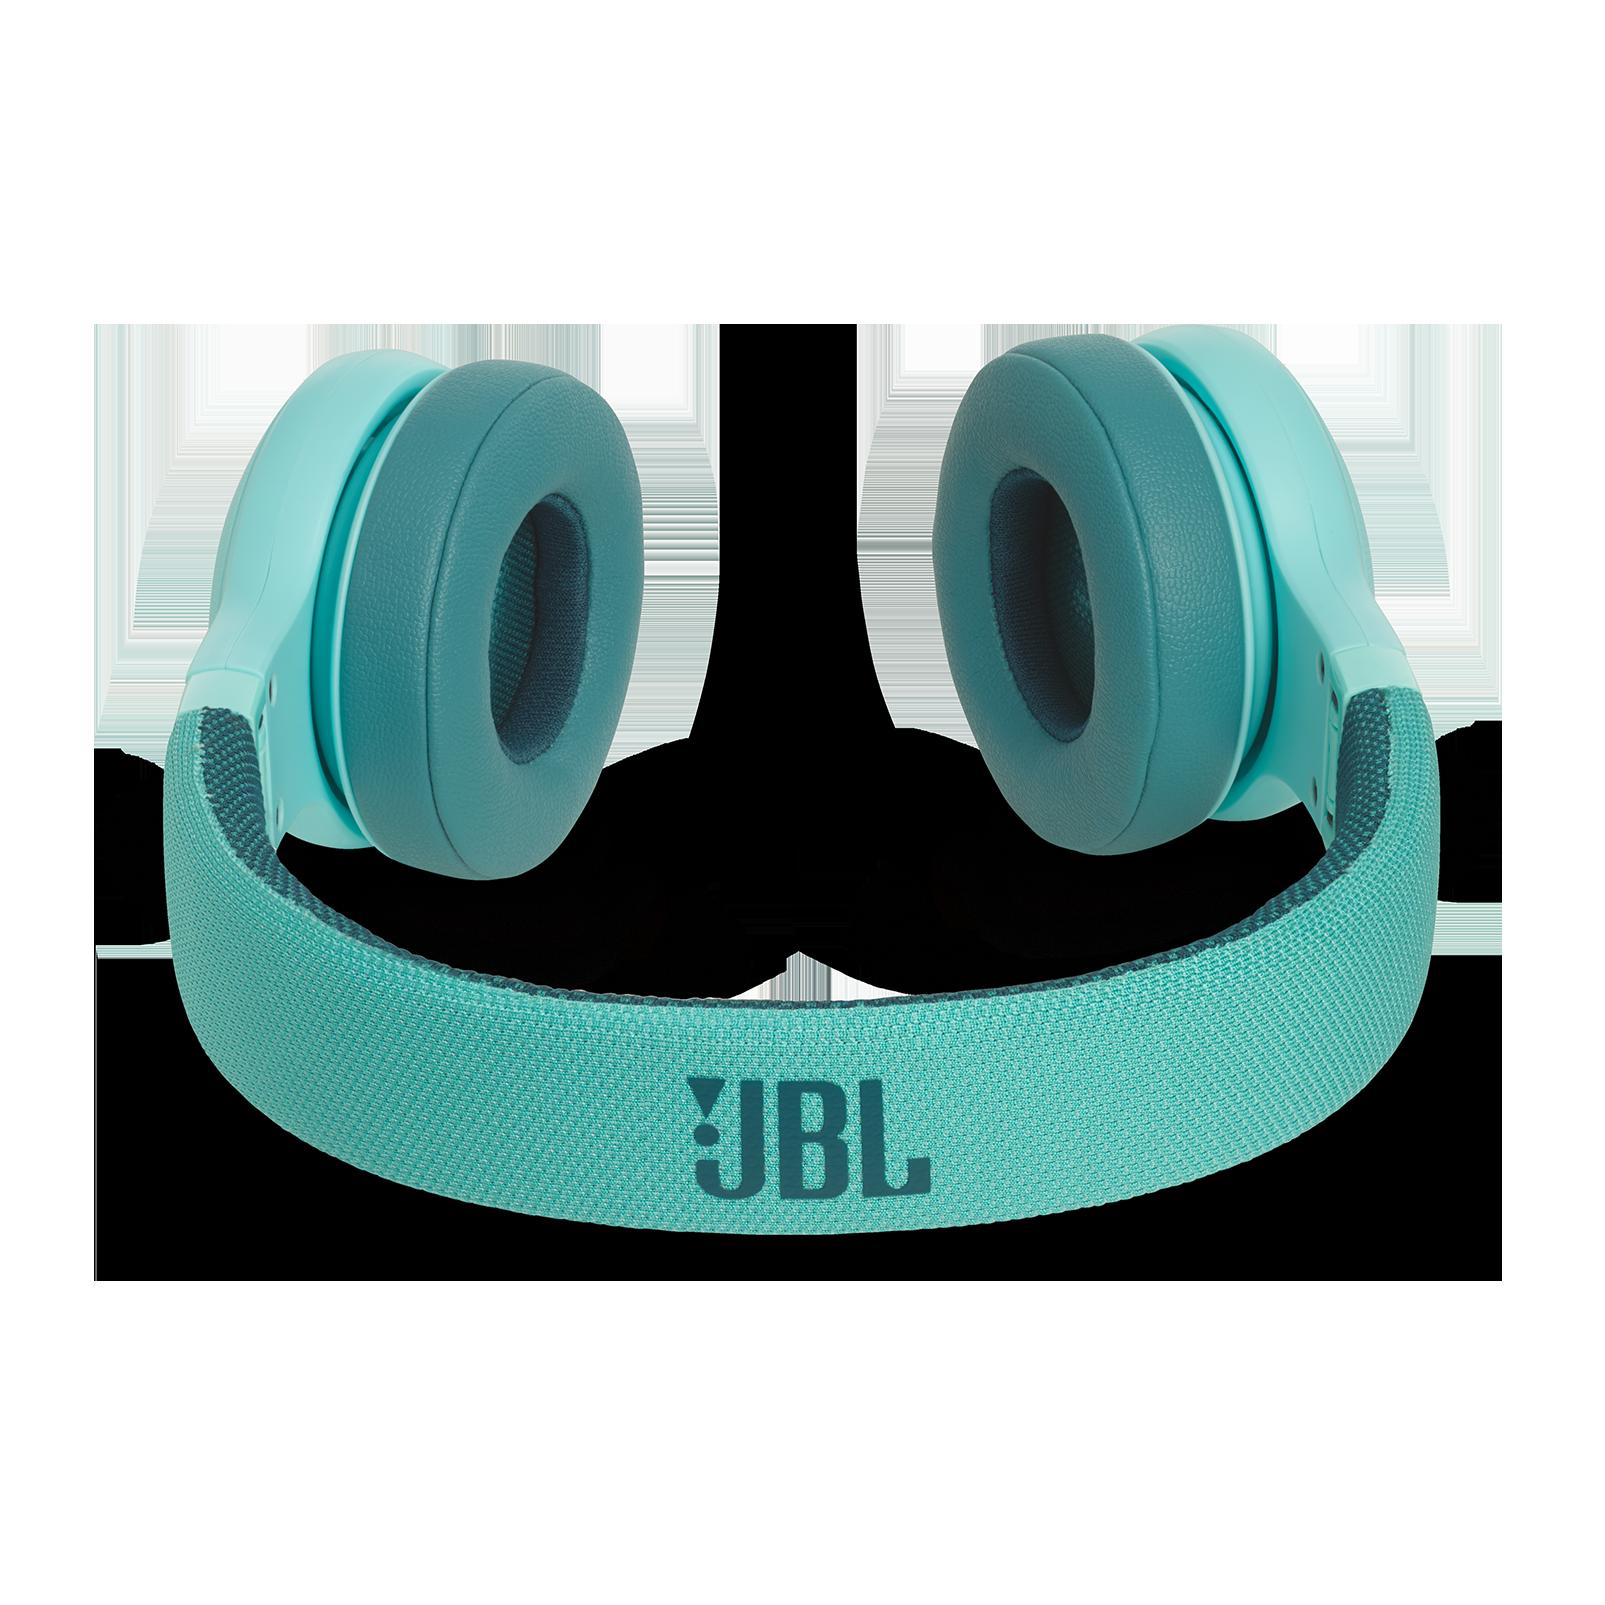 JBL E45BT - Teal - Wireless on-ear headphones - Detailshot 3